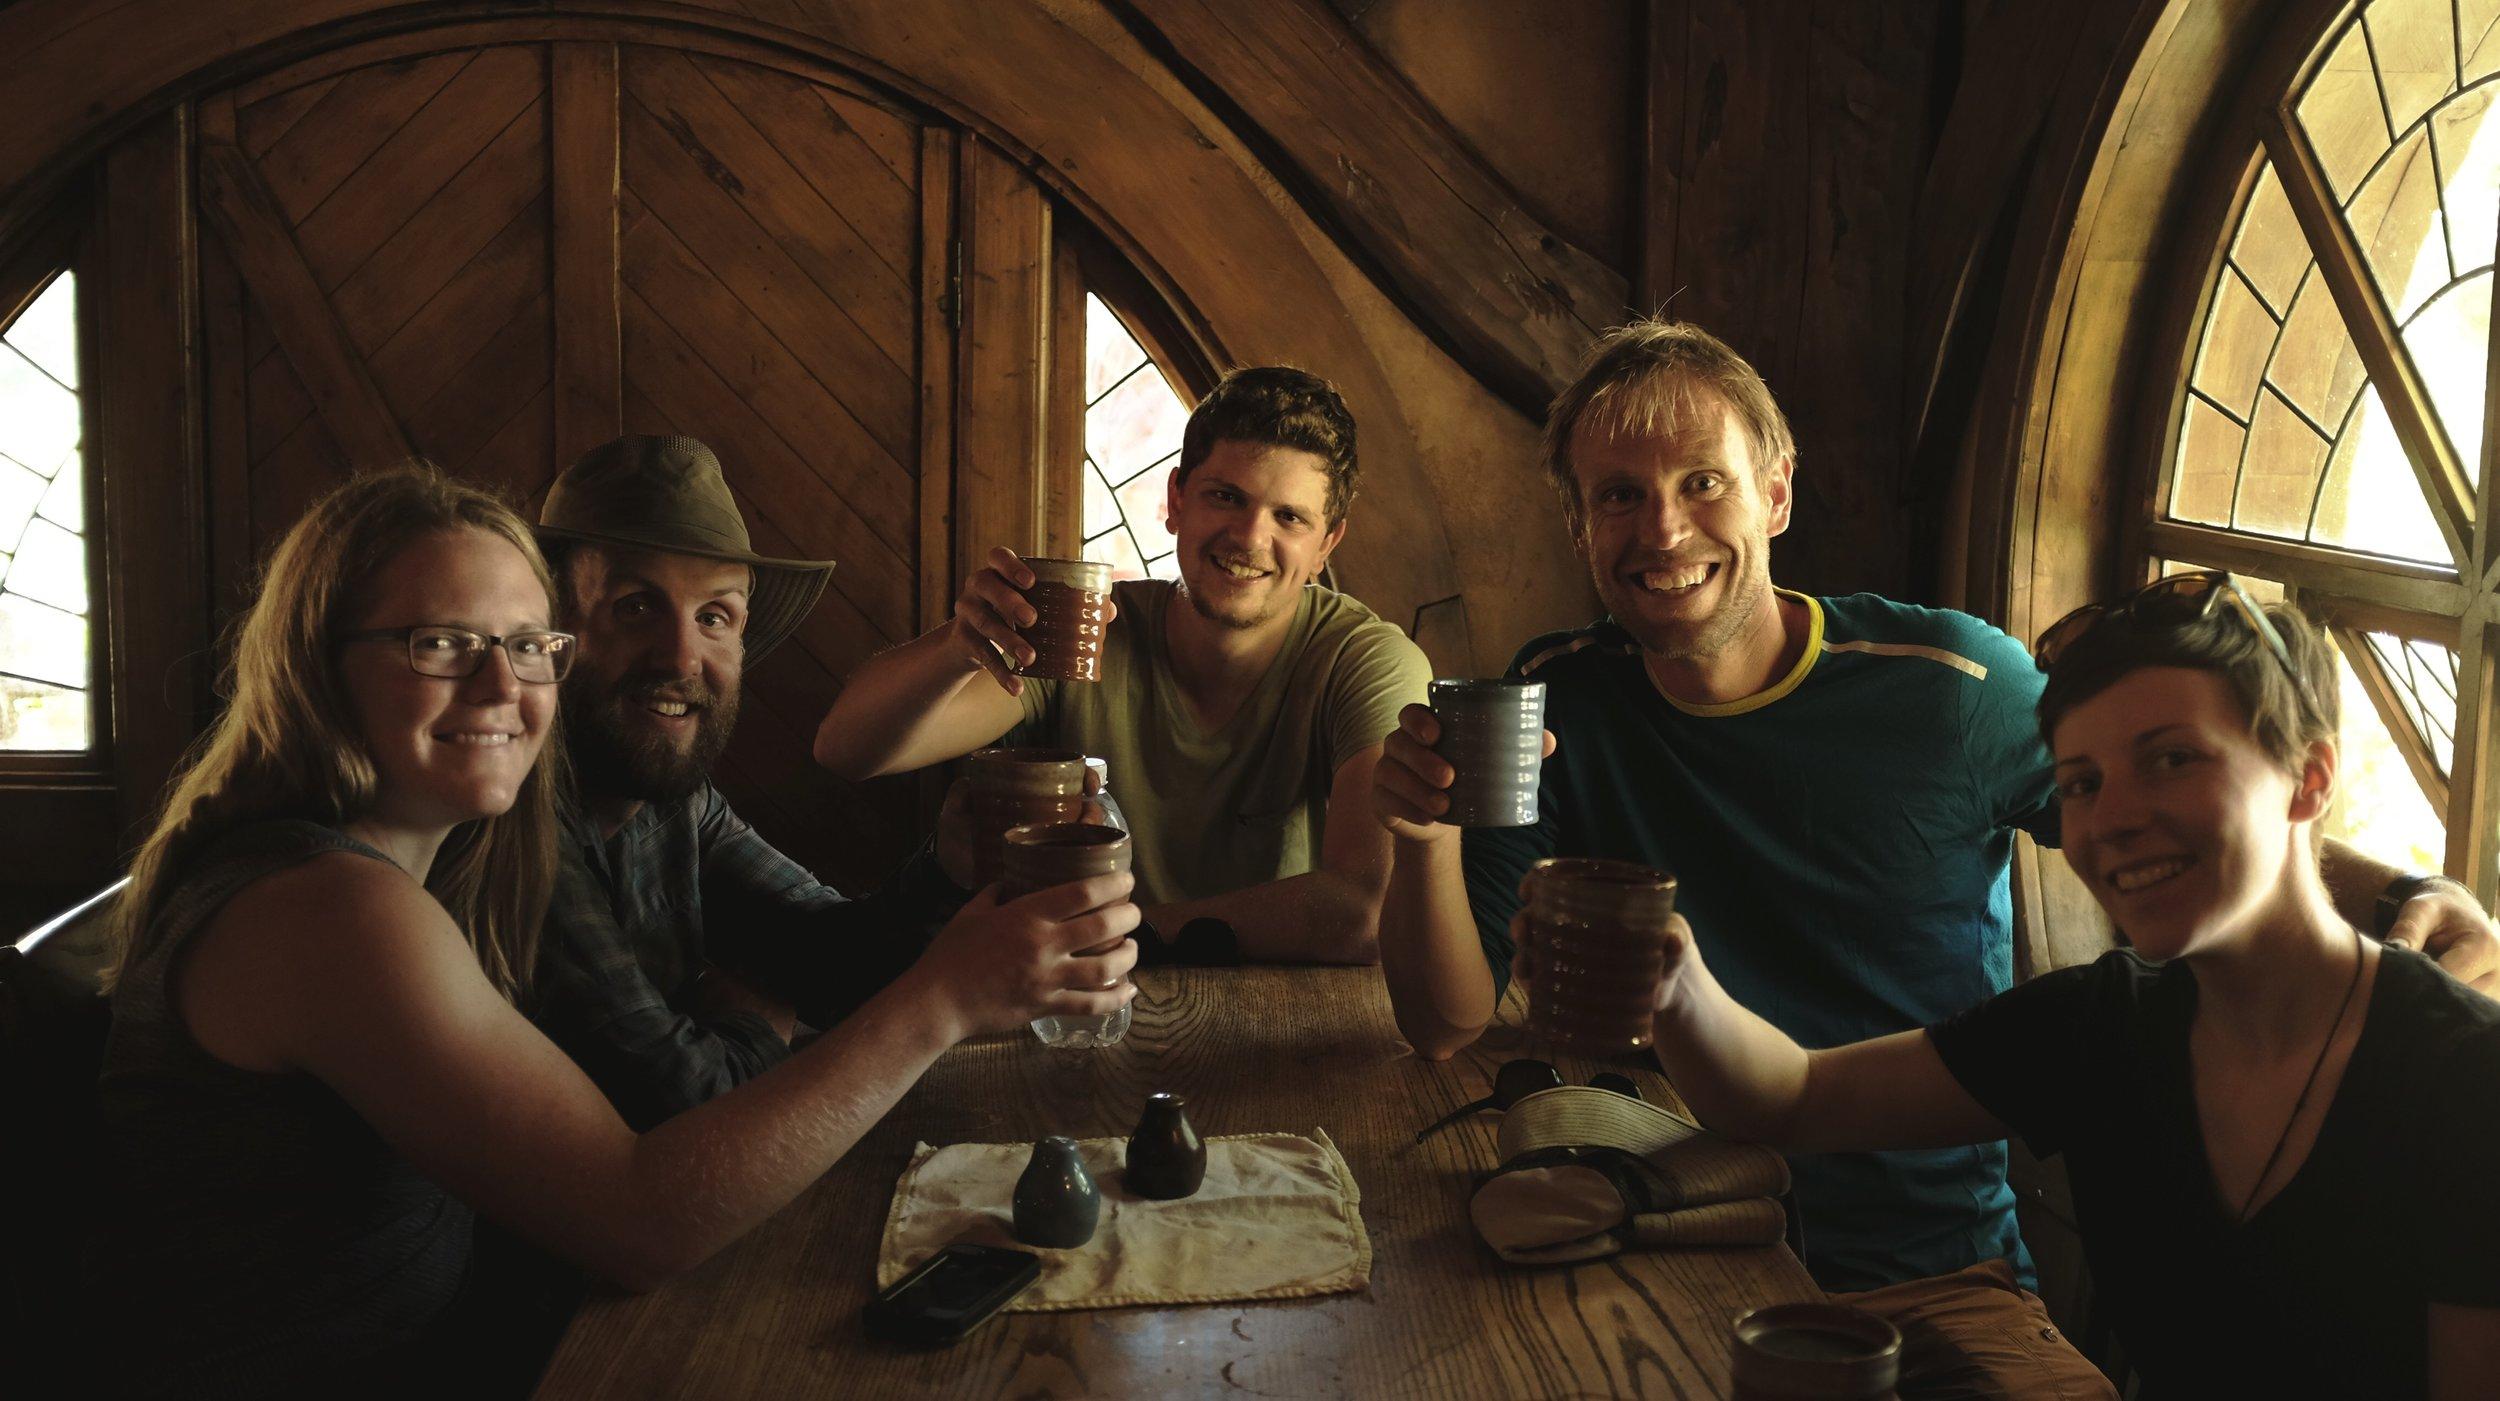 Enjoying a brew at the Green Dragon Inn!